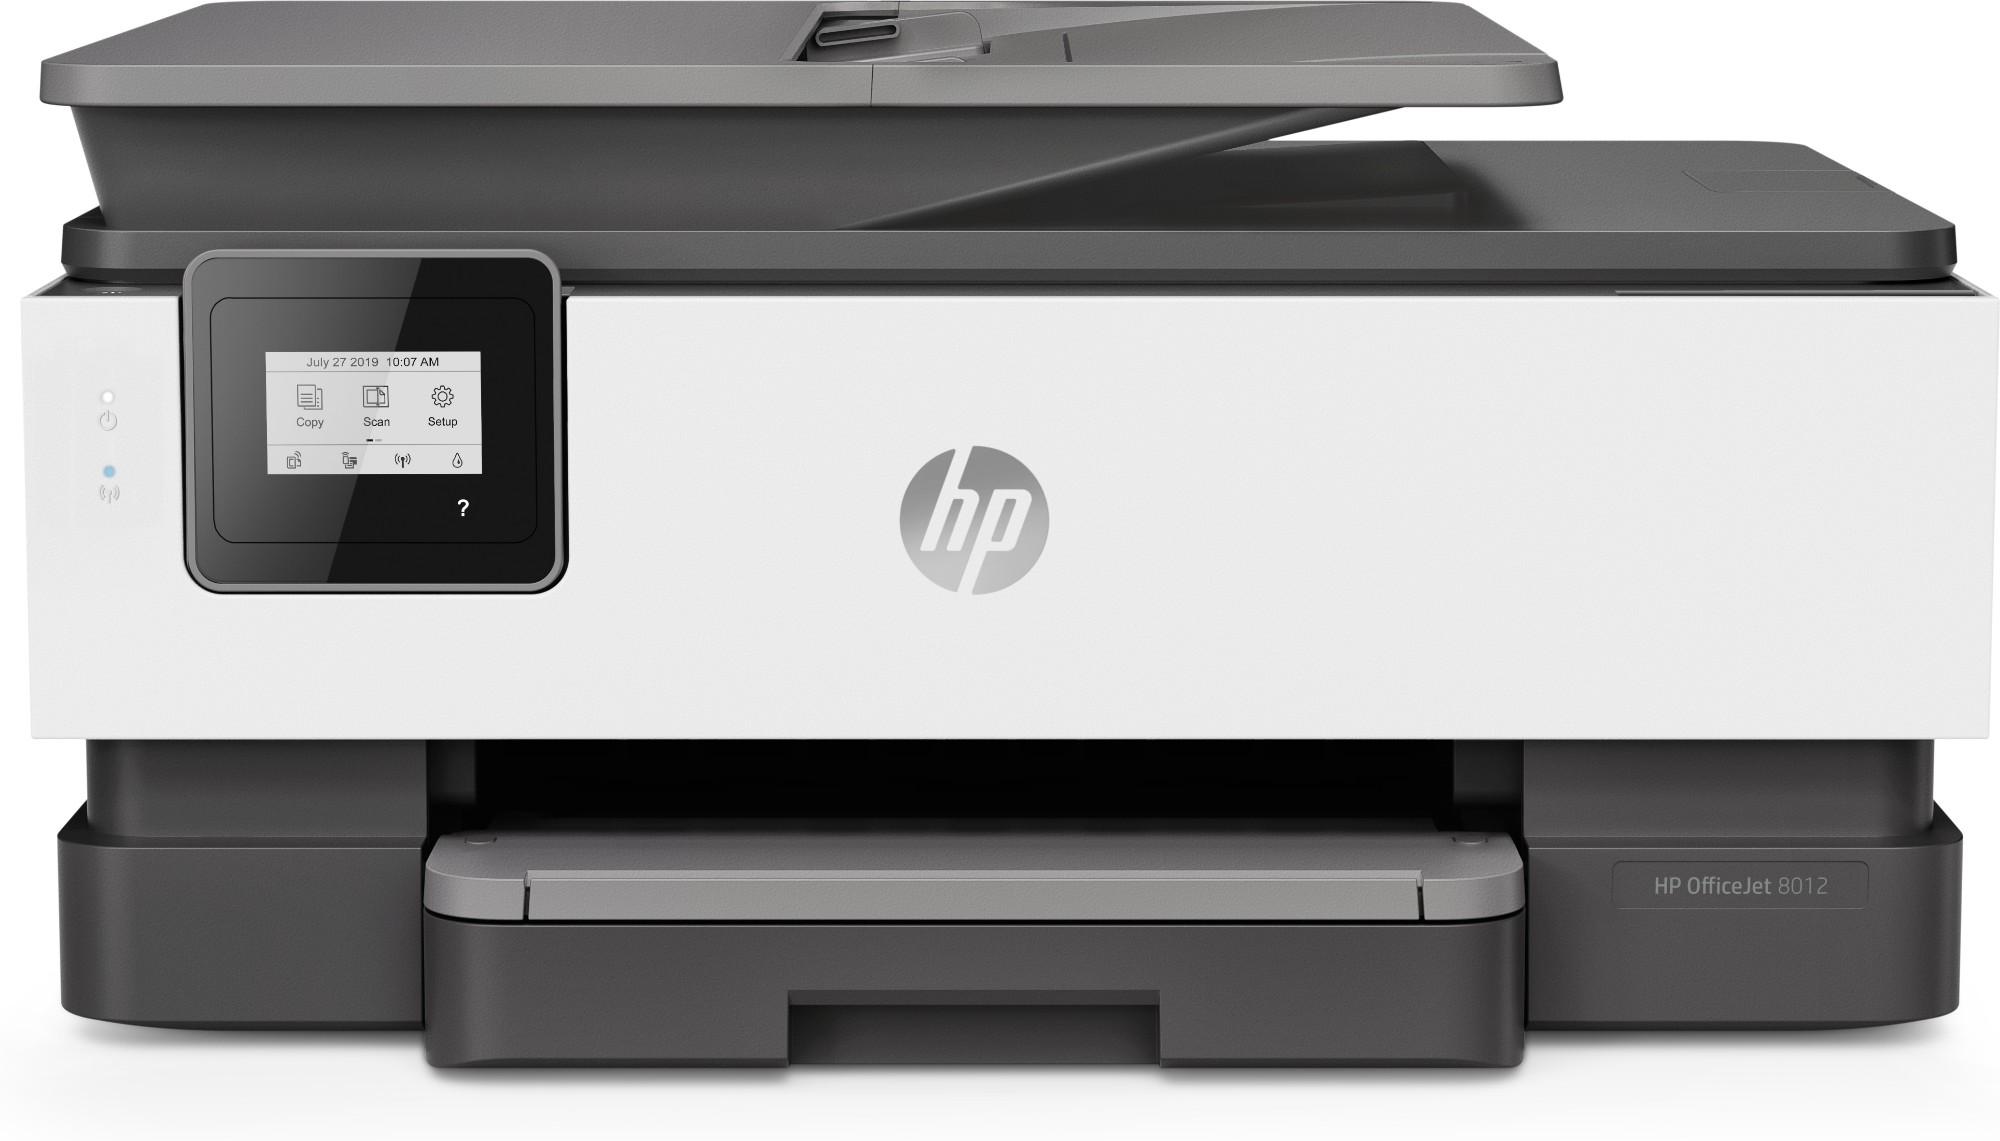 HP OfficeJet 8012 Thermal Inkjet 4800 x 1200 DPI 18 ppm A4 Wi-Fi